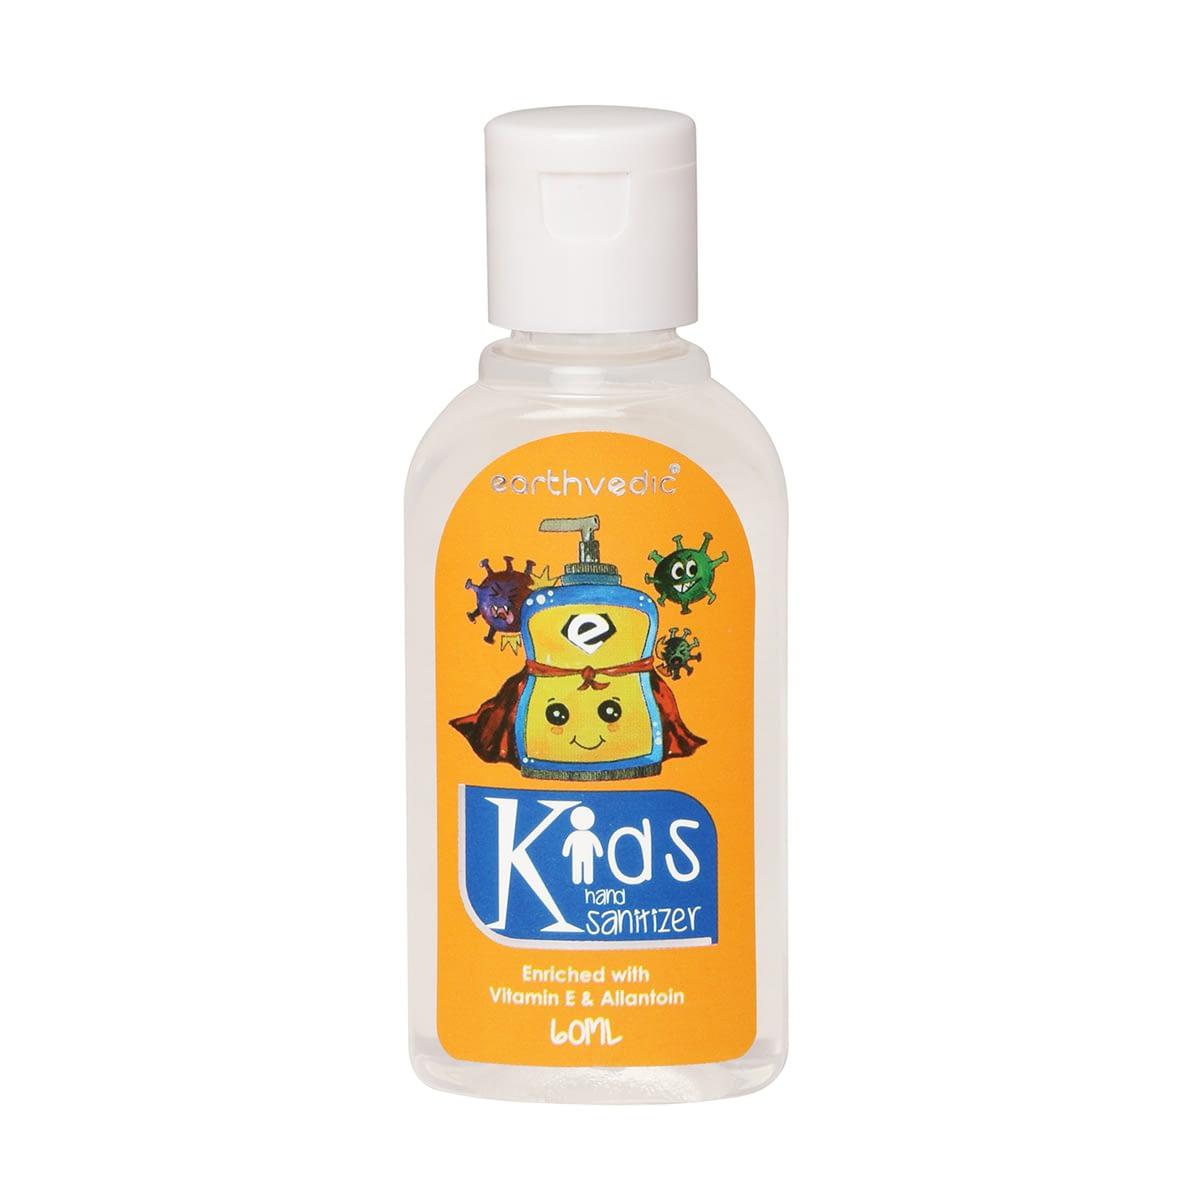 earthvedic kids sanitizer-front